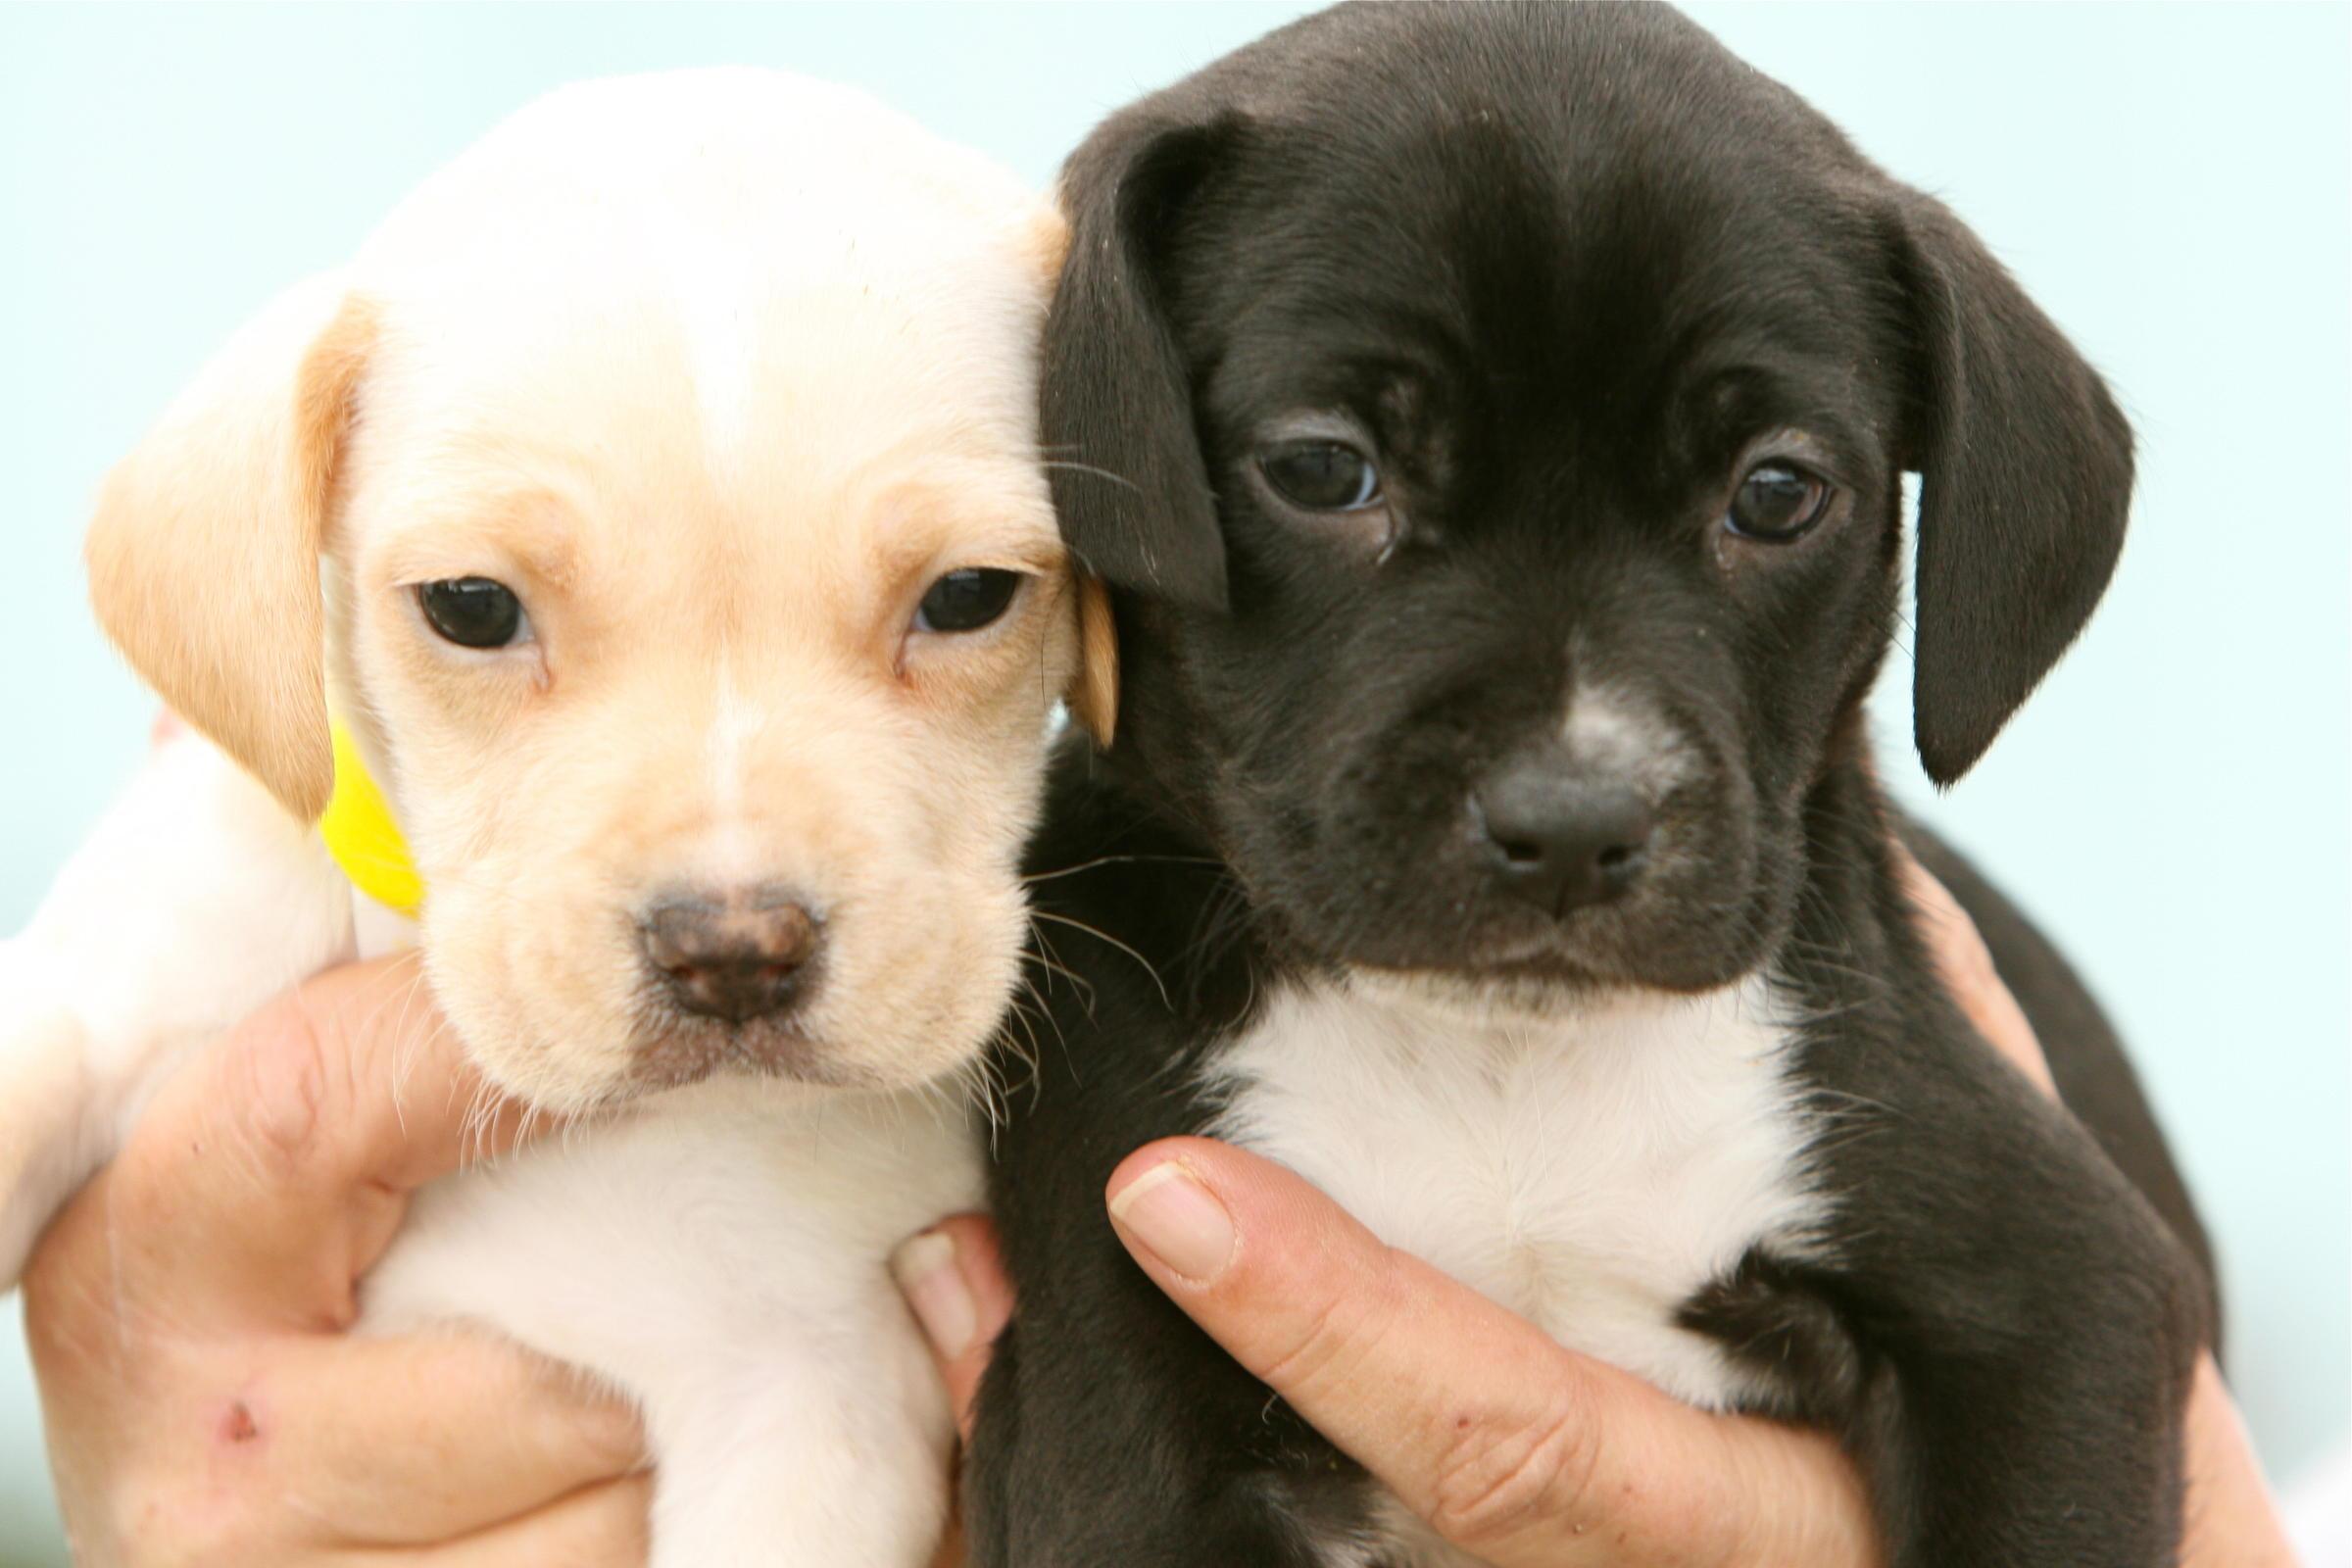 Puppy Mills | Alabama Public Radio